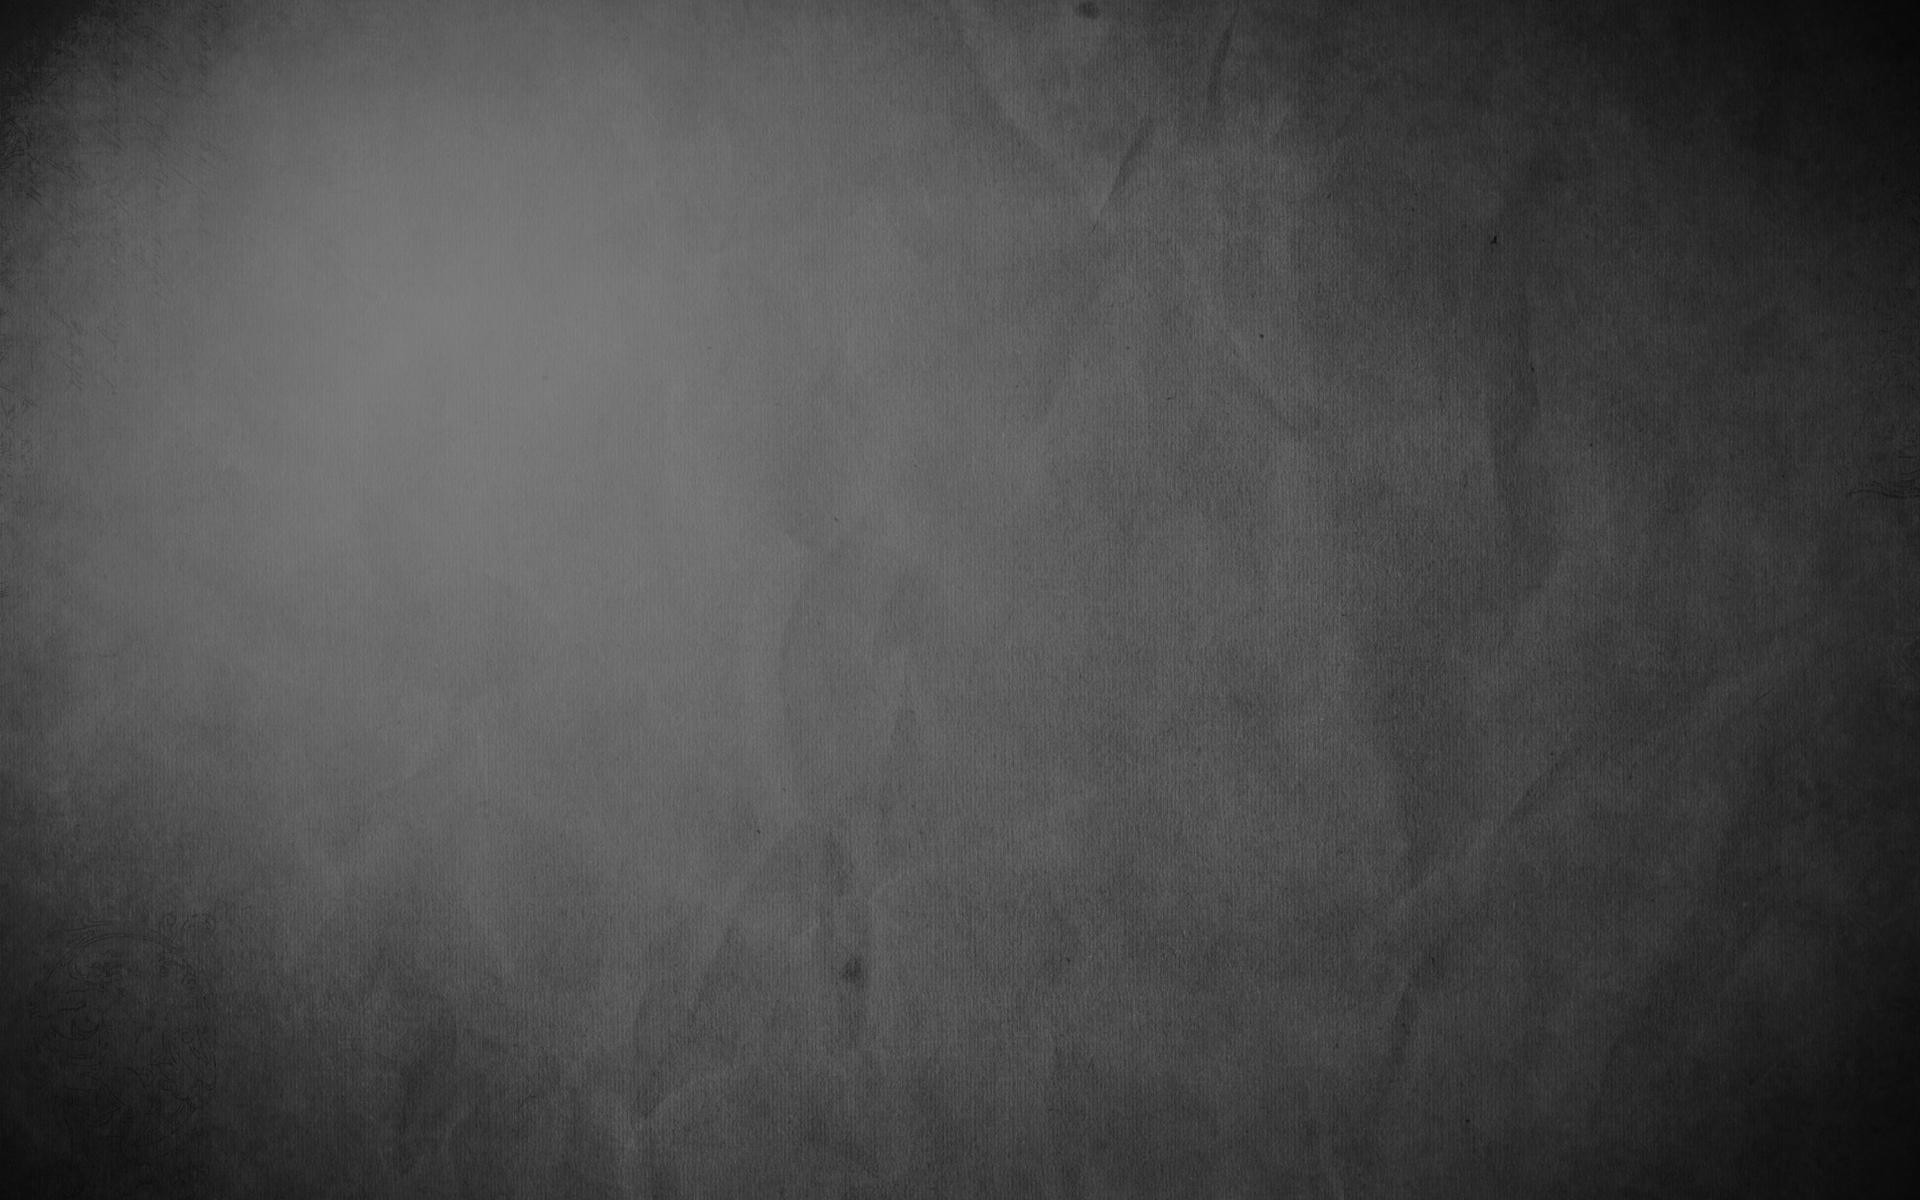 Black-Grunge-Wallpapers-HD-Free-Download